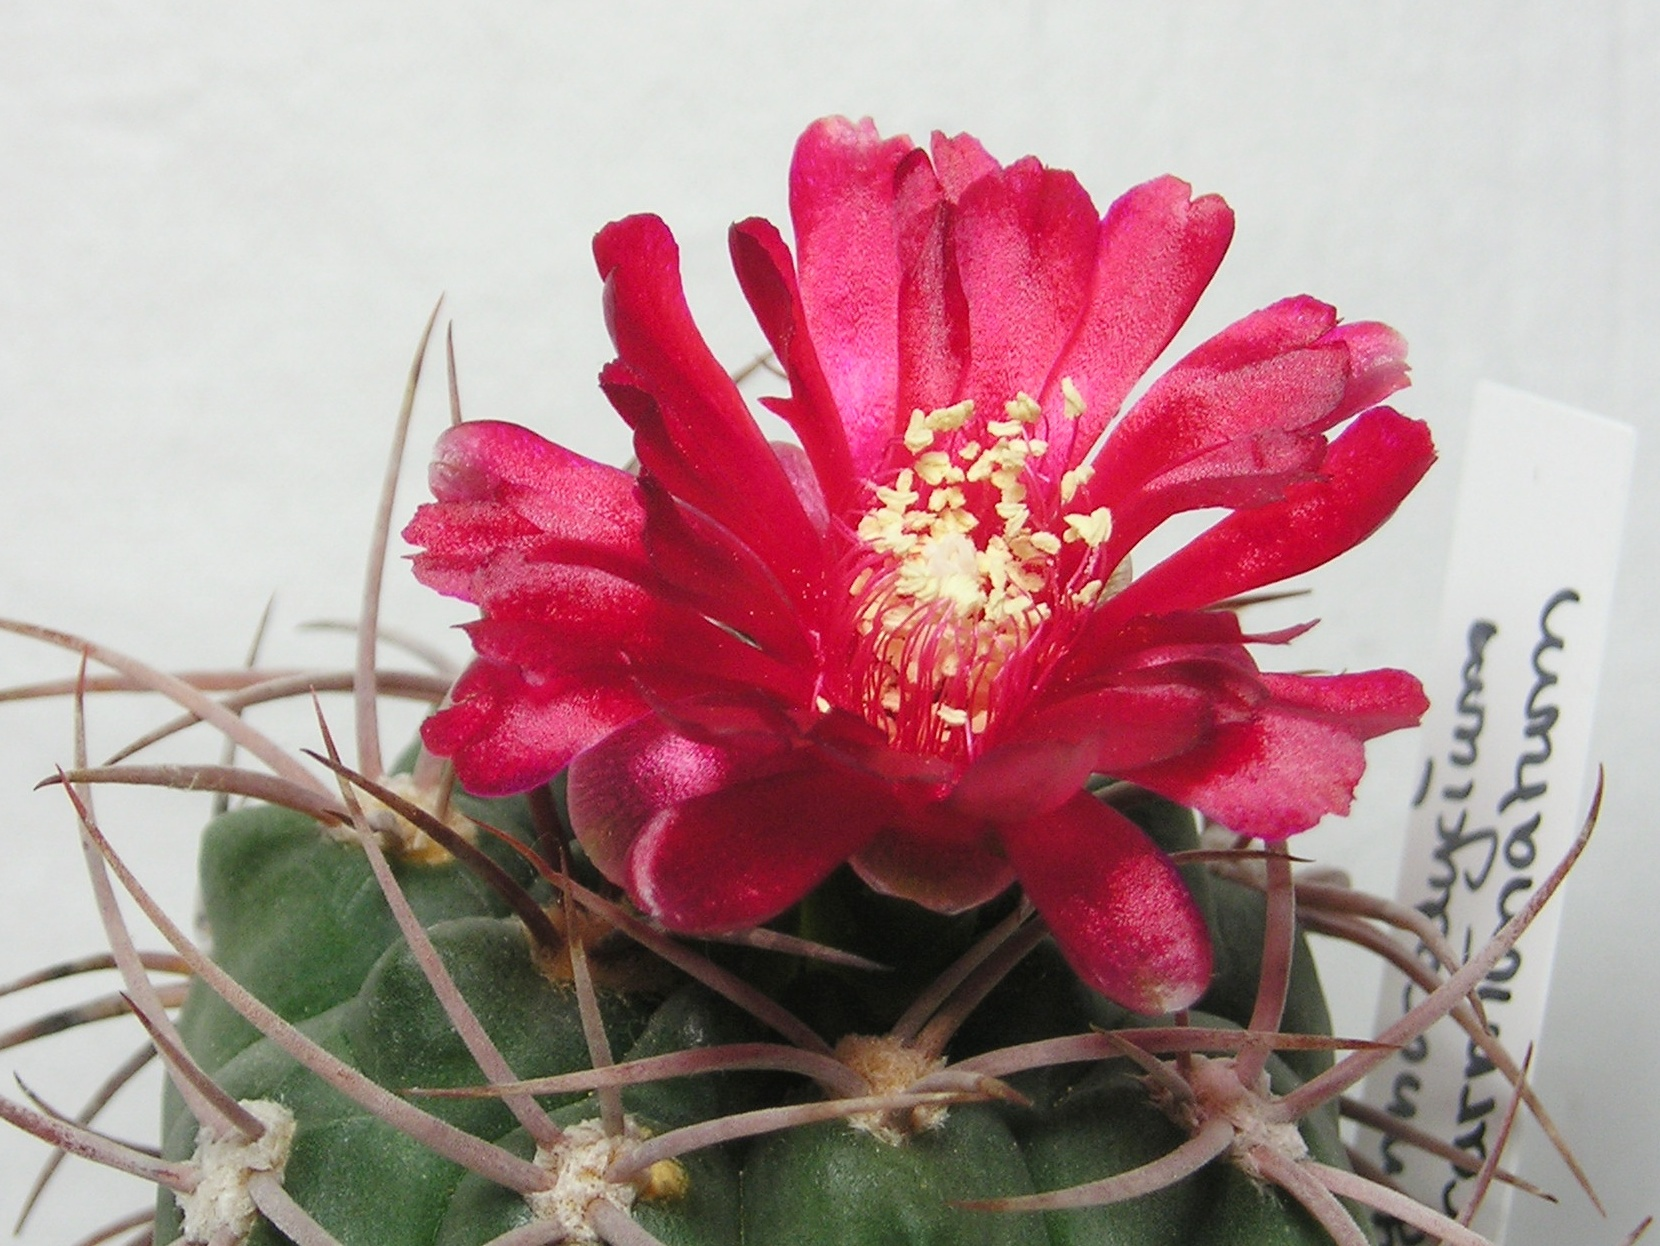 File:Gymnocalycium oenanthemum.jpg - Wikimedia Commons